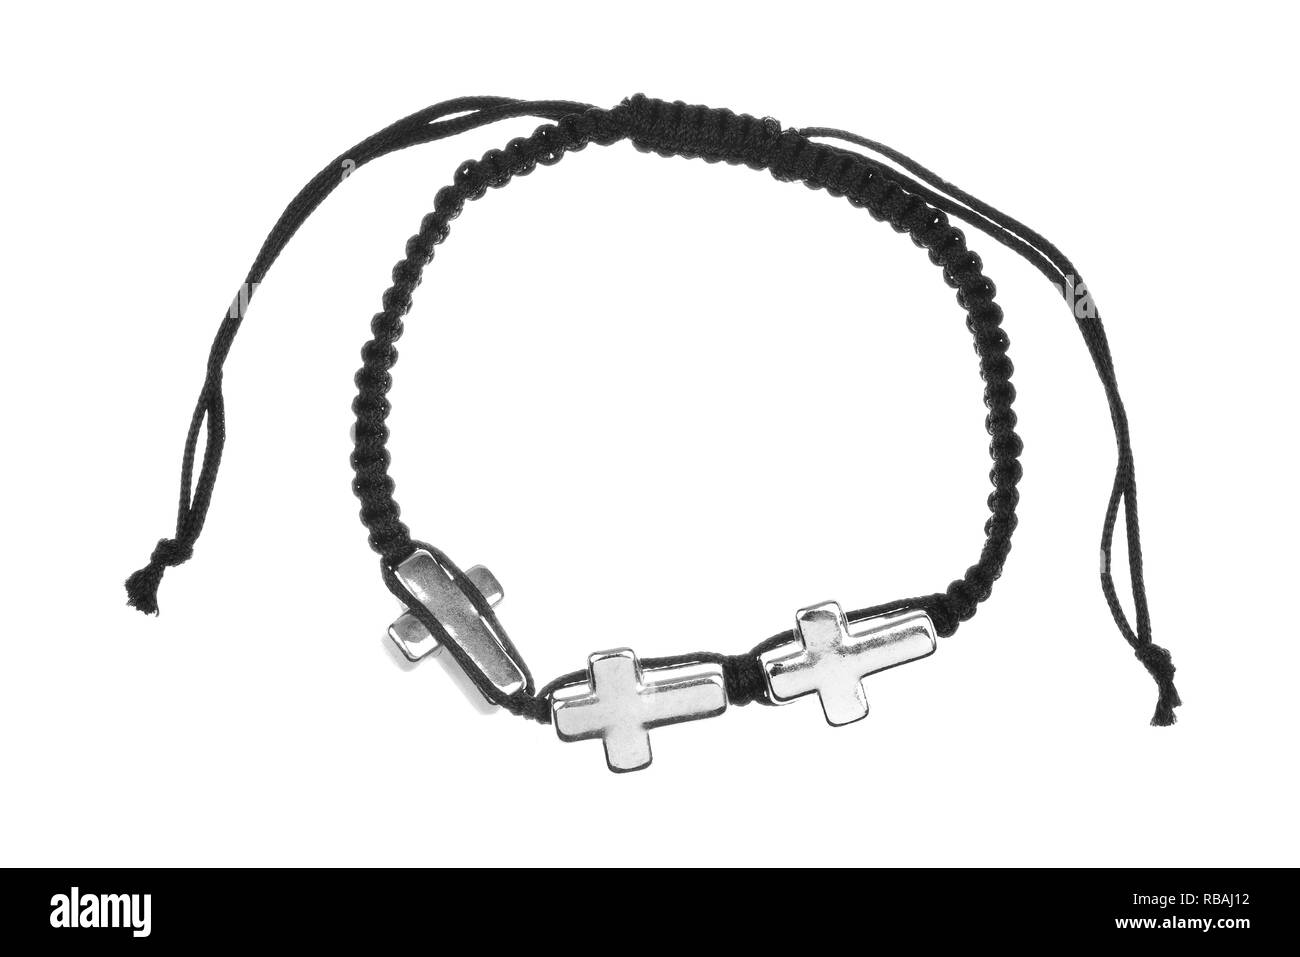 Black textile bracelet with three metallic crosses, isolated on white background - Stock Image